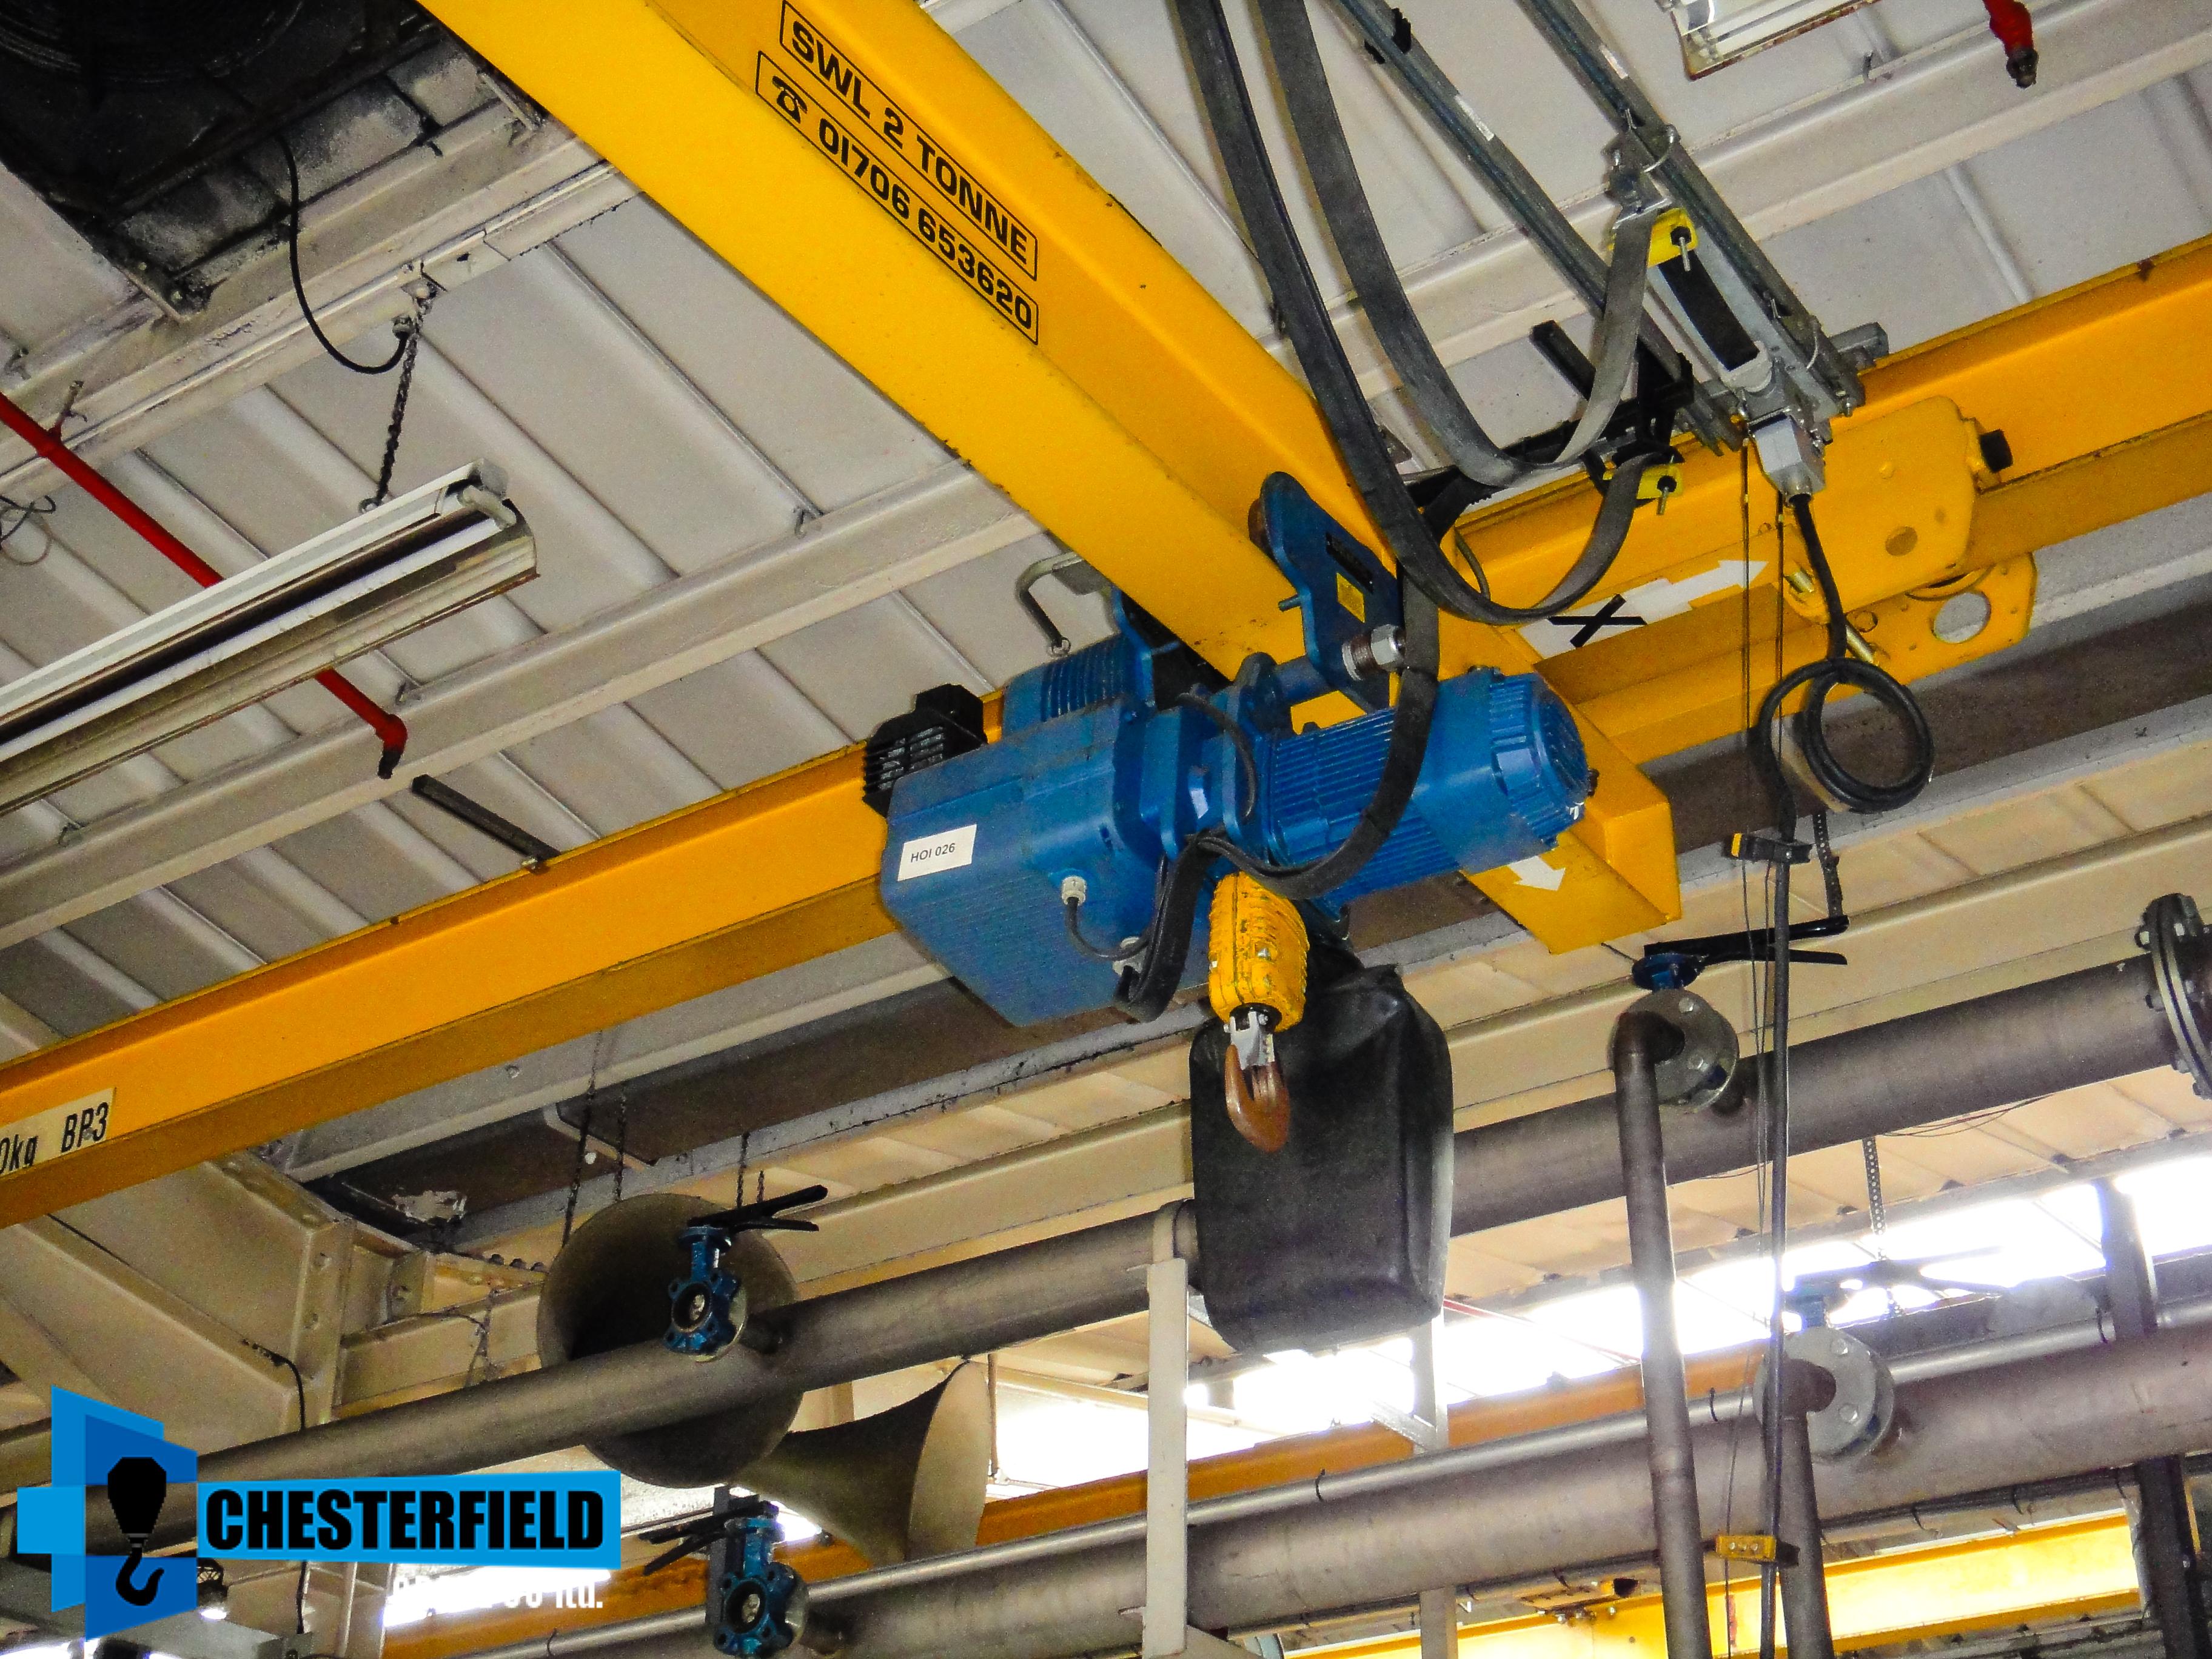 Overhead Crane Parts Uk : Used granada tonne metre underhung mounted overhead